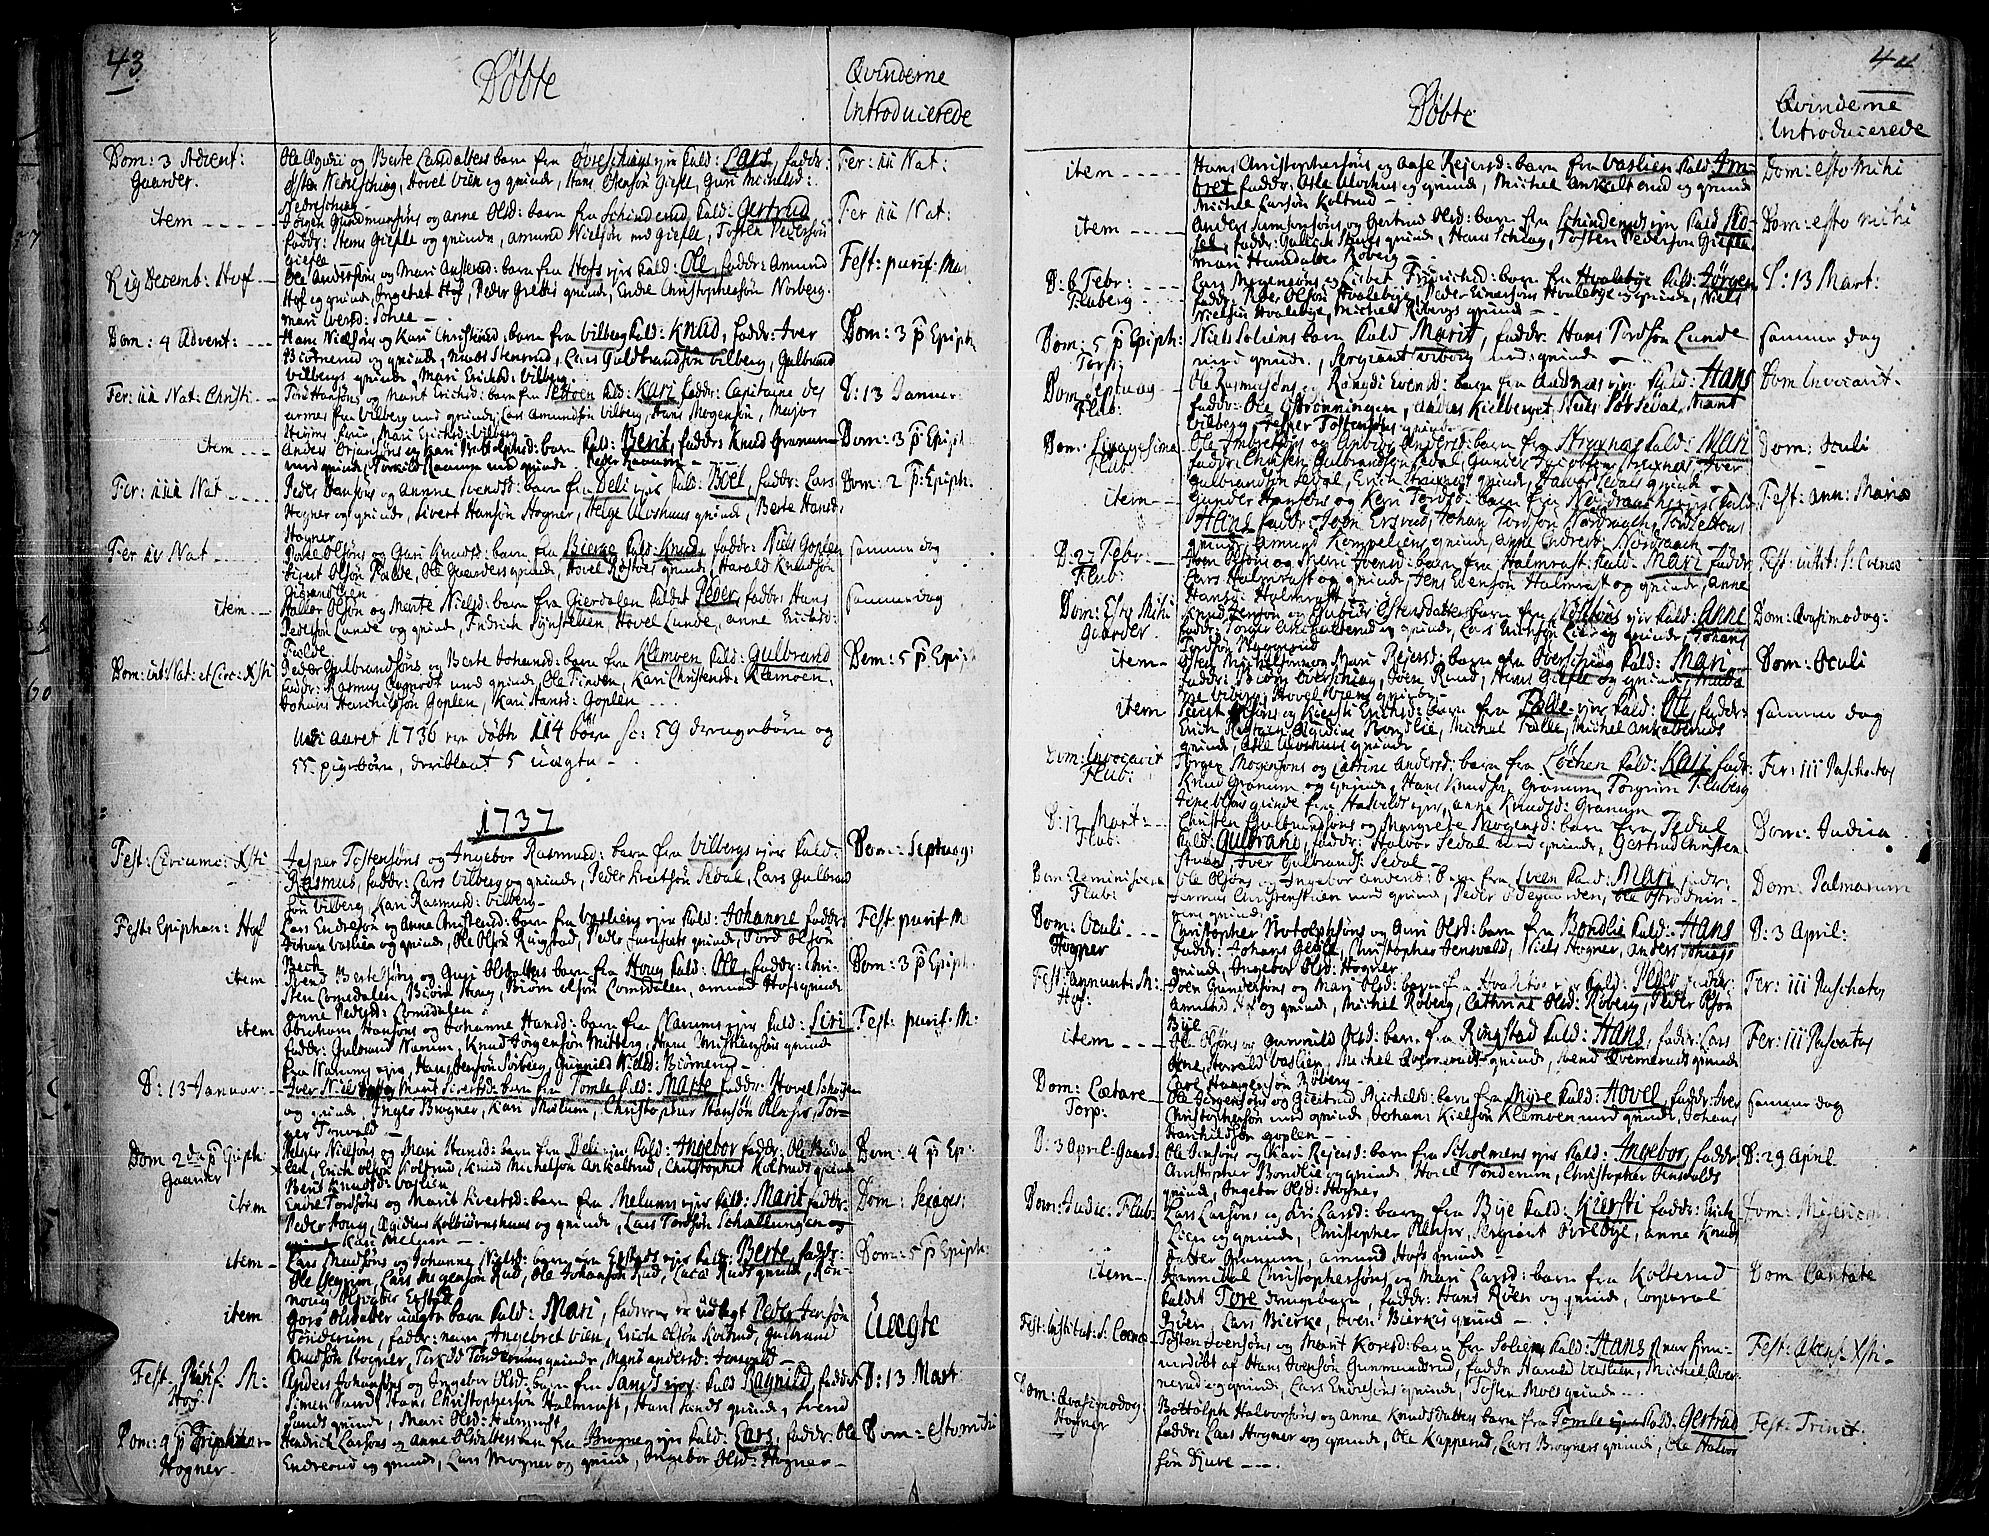 SAH, Land prestekontor, Ministerialbok nr. 2, 1733-1764, s. 43-44